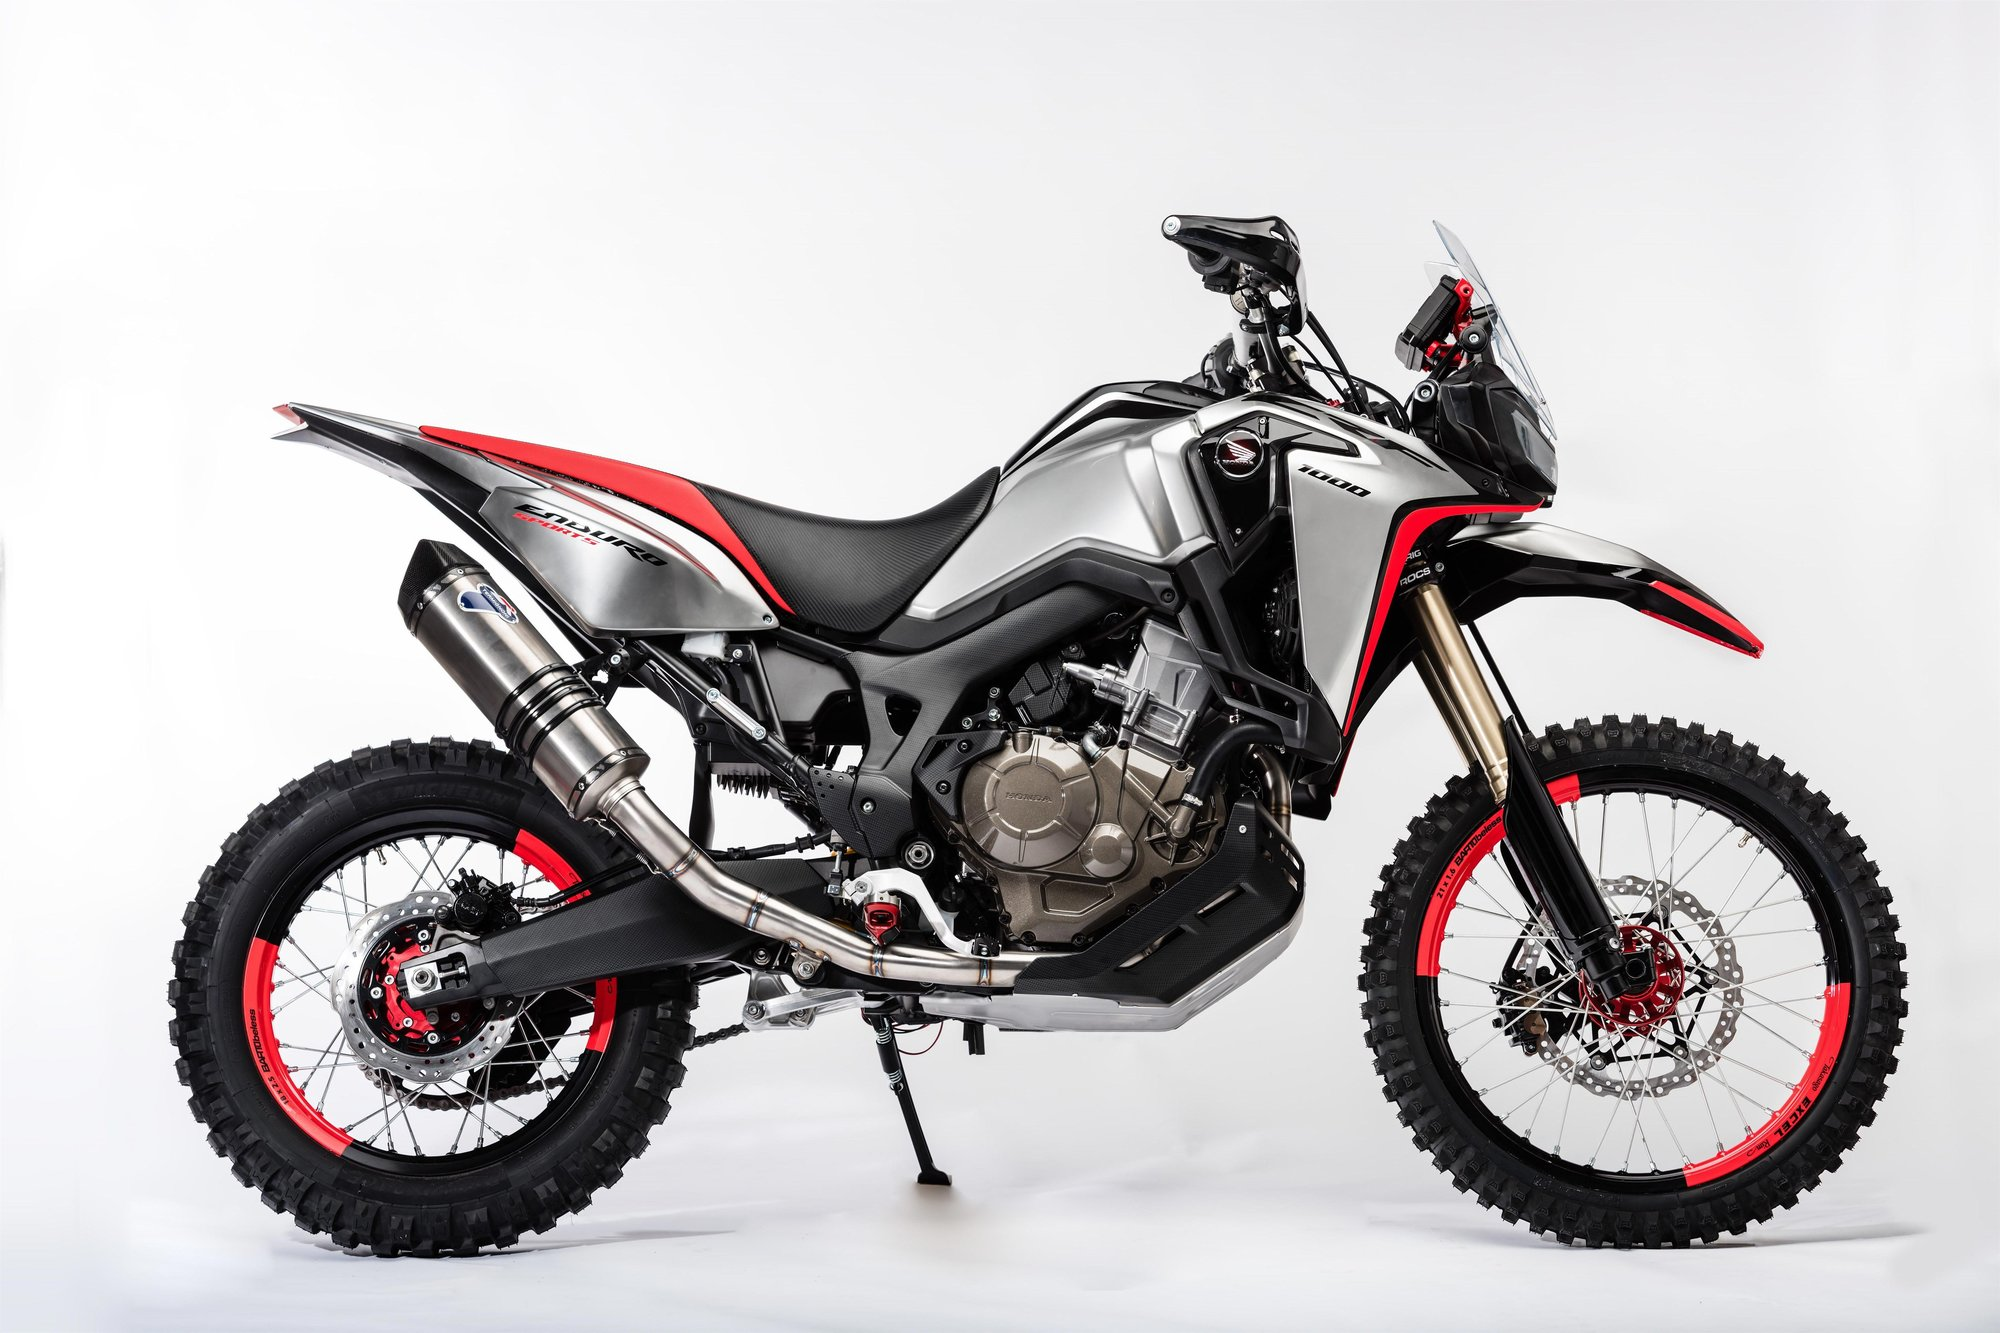 Honda-Africa-Twin-Enduro-Sports-Concept (2).jpg